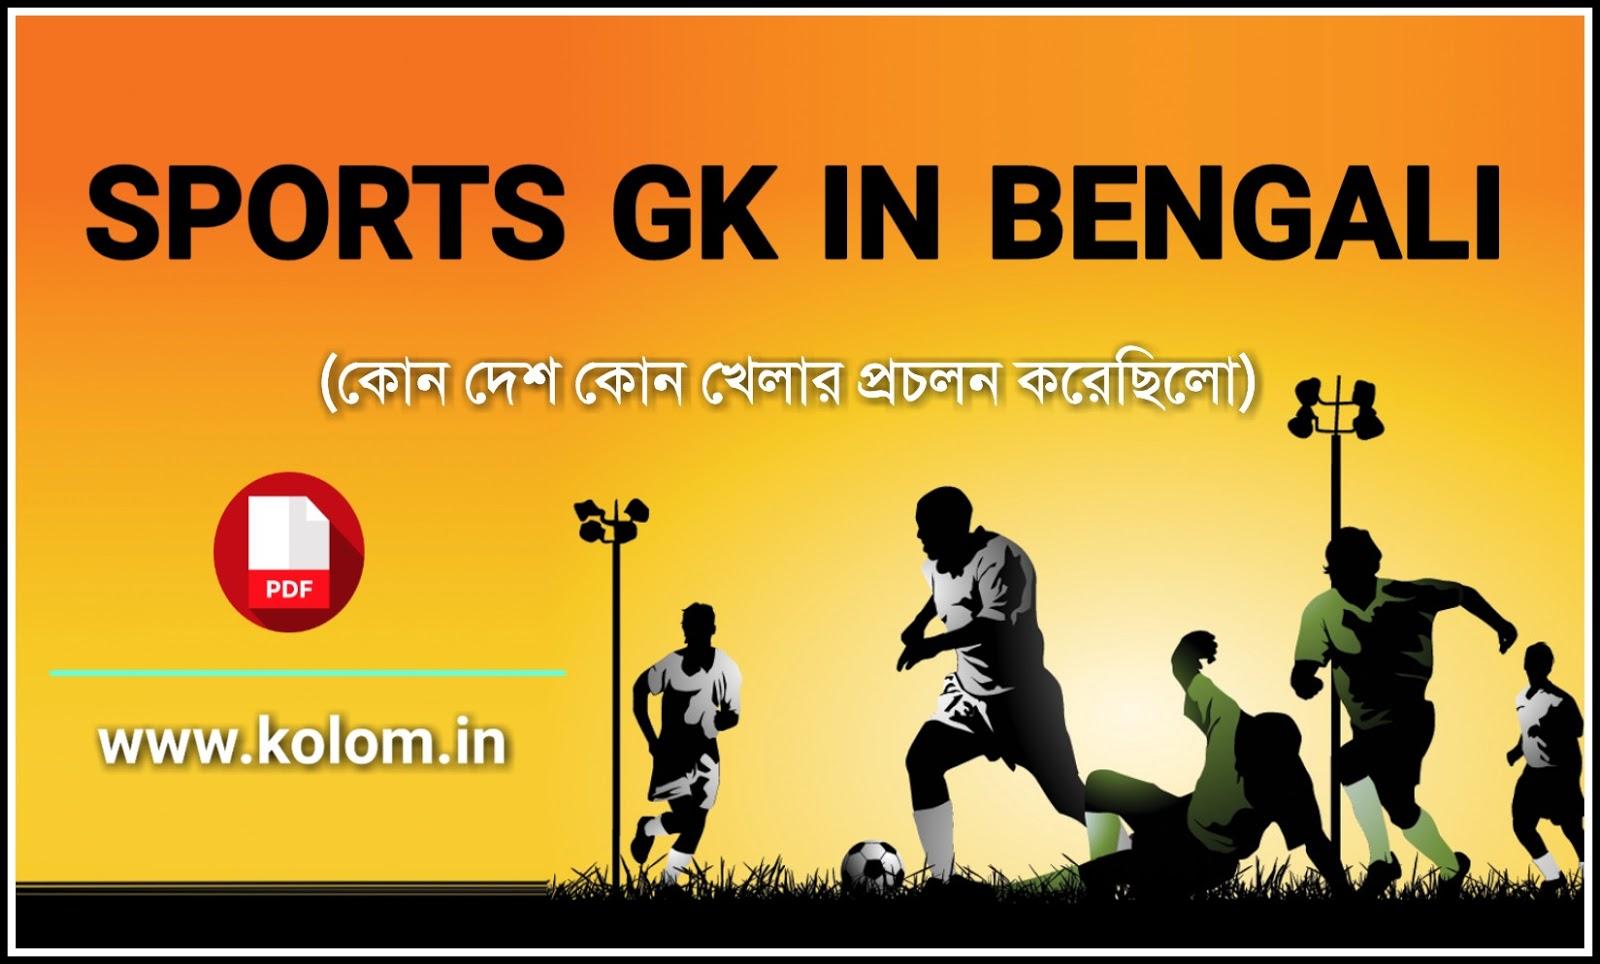 Sports GK in Bengali PDF for Competitive Exam - খেলাধুলা জিকে